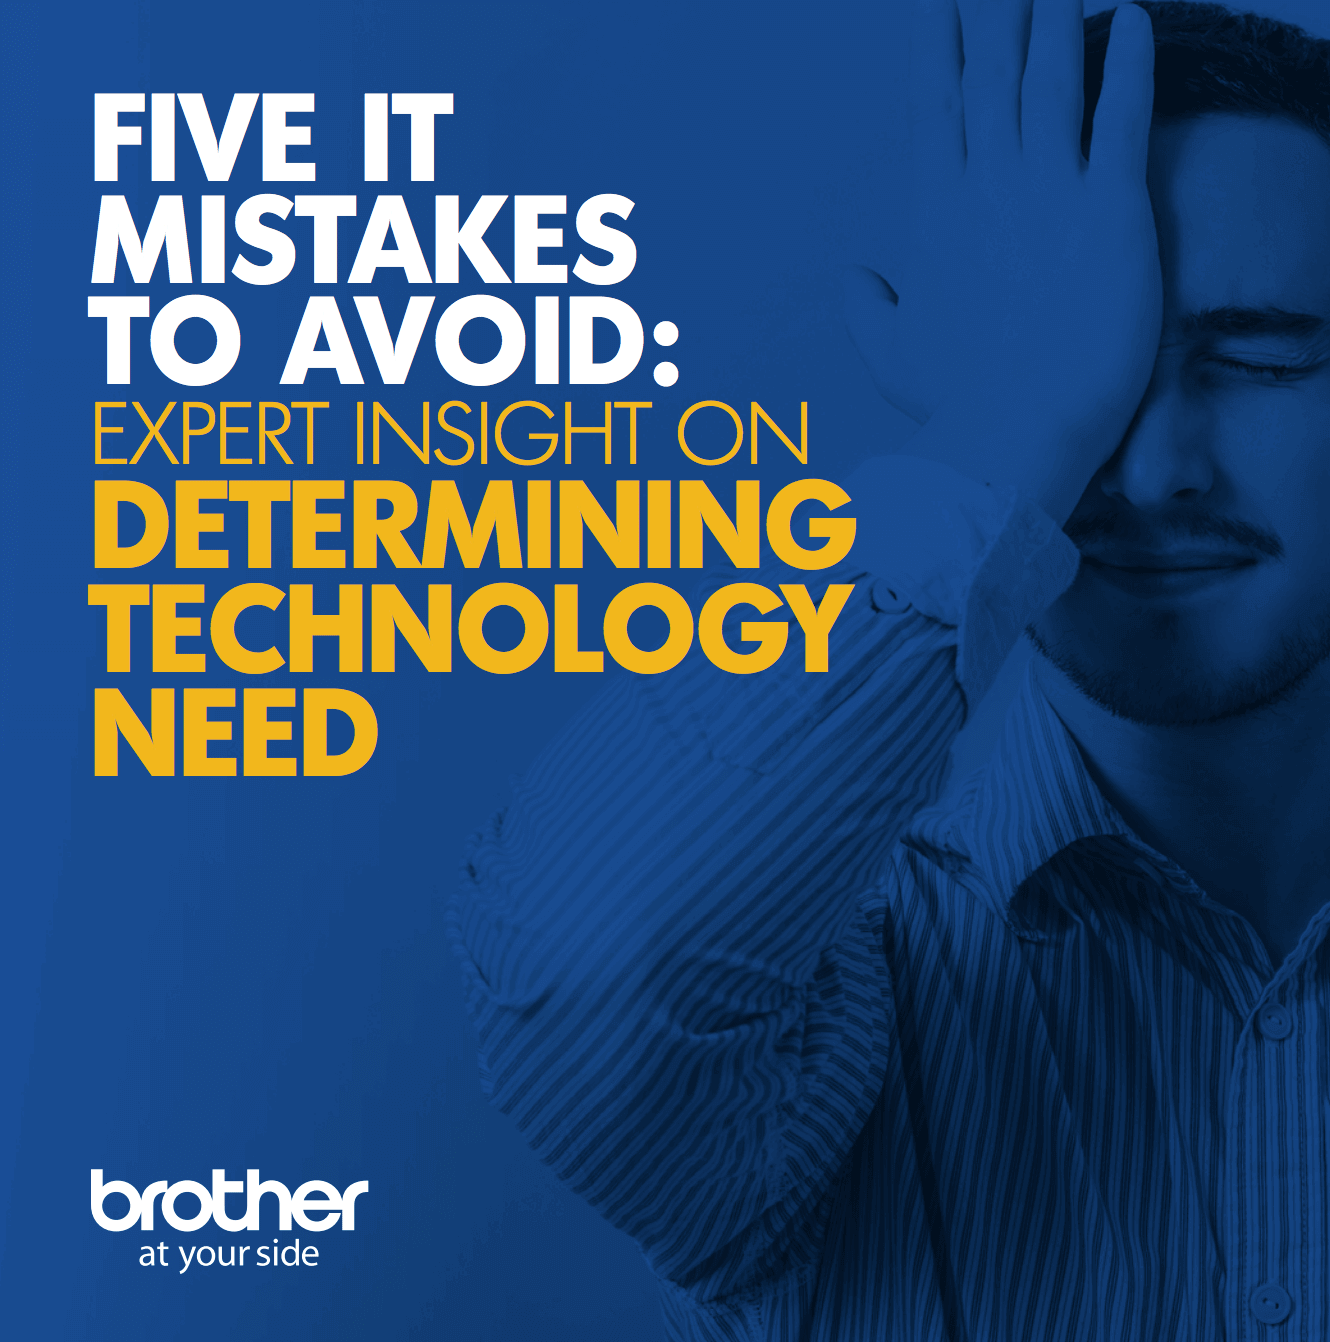 Five IT Mistakes logo